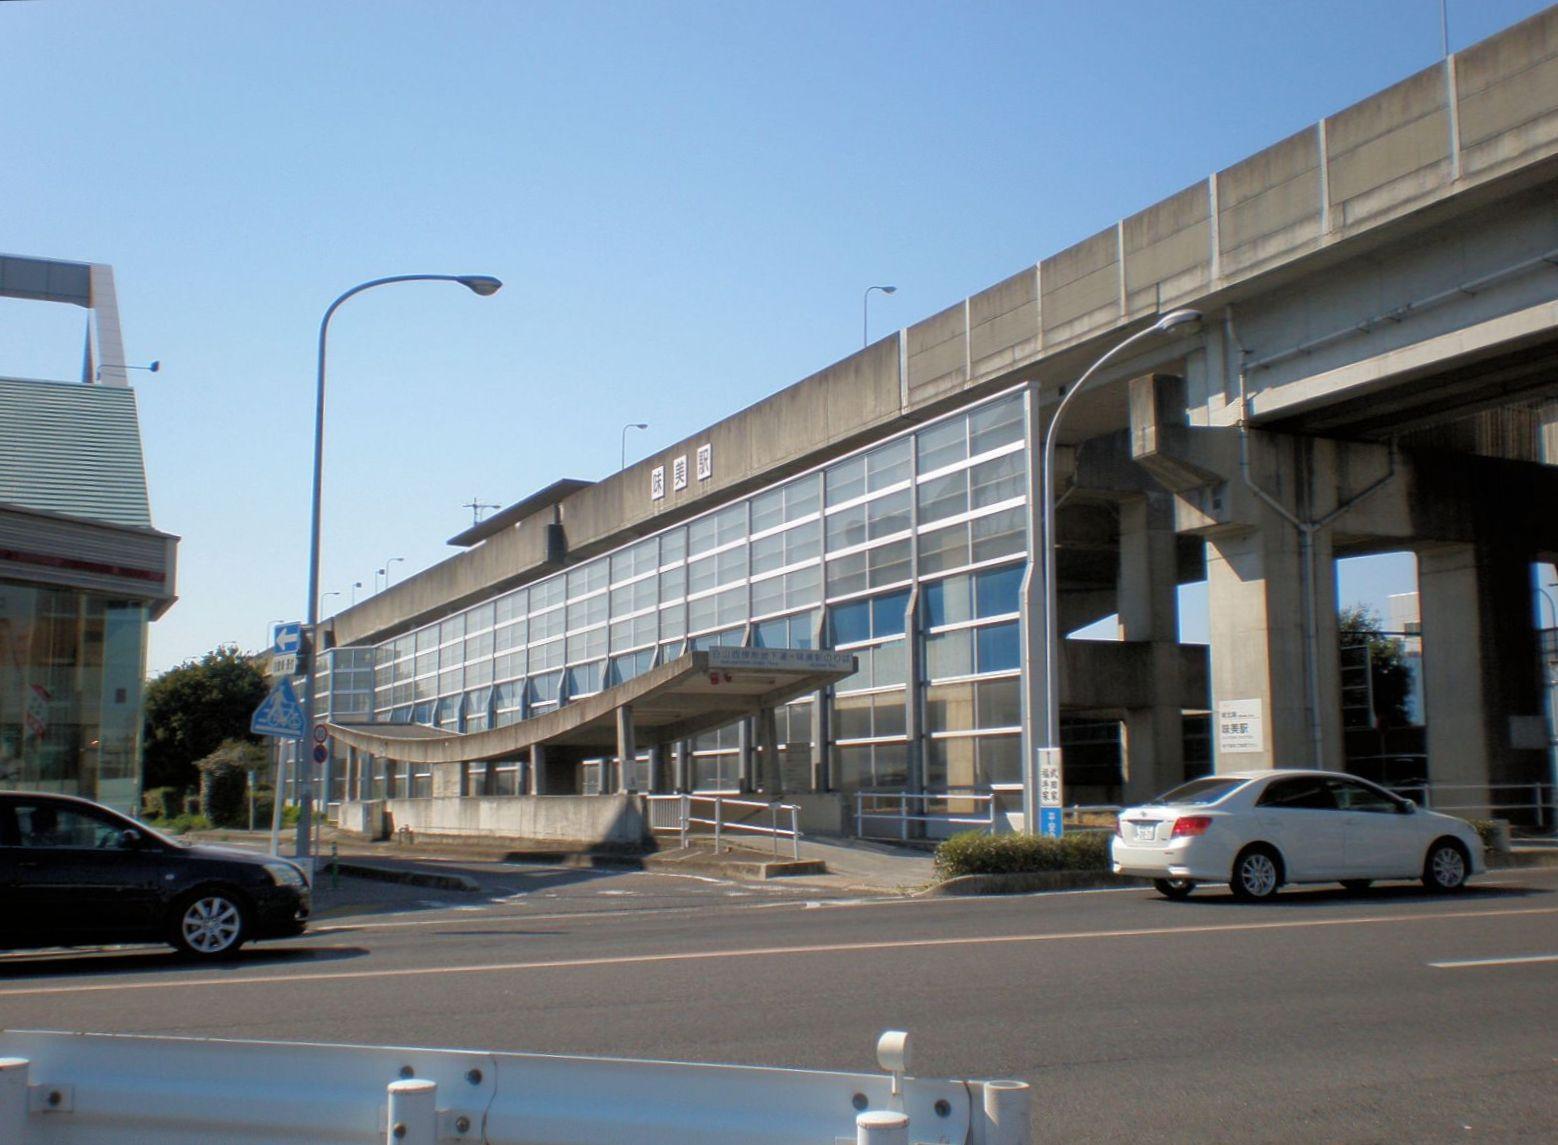 https://upload.wikimedia.org/wikipedia/commons/2/25/Ajiyoshi_Station_%28Tokai_Transport_Service%29.jpeg